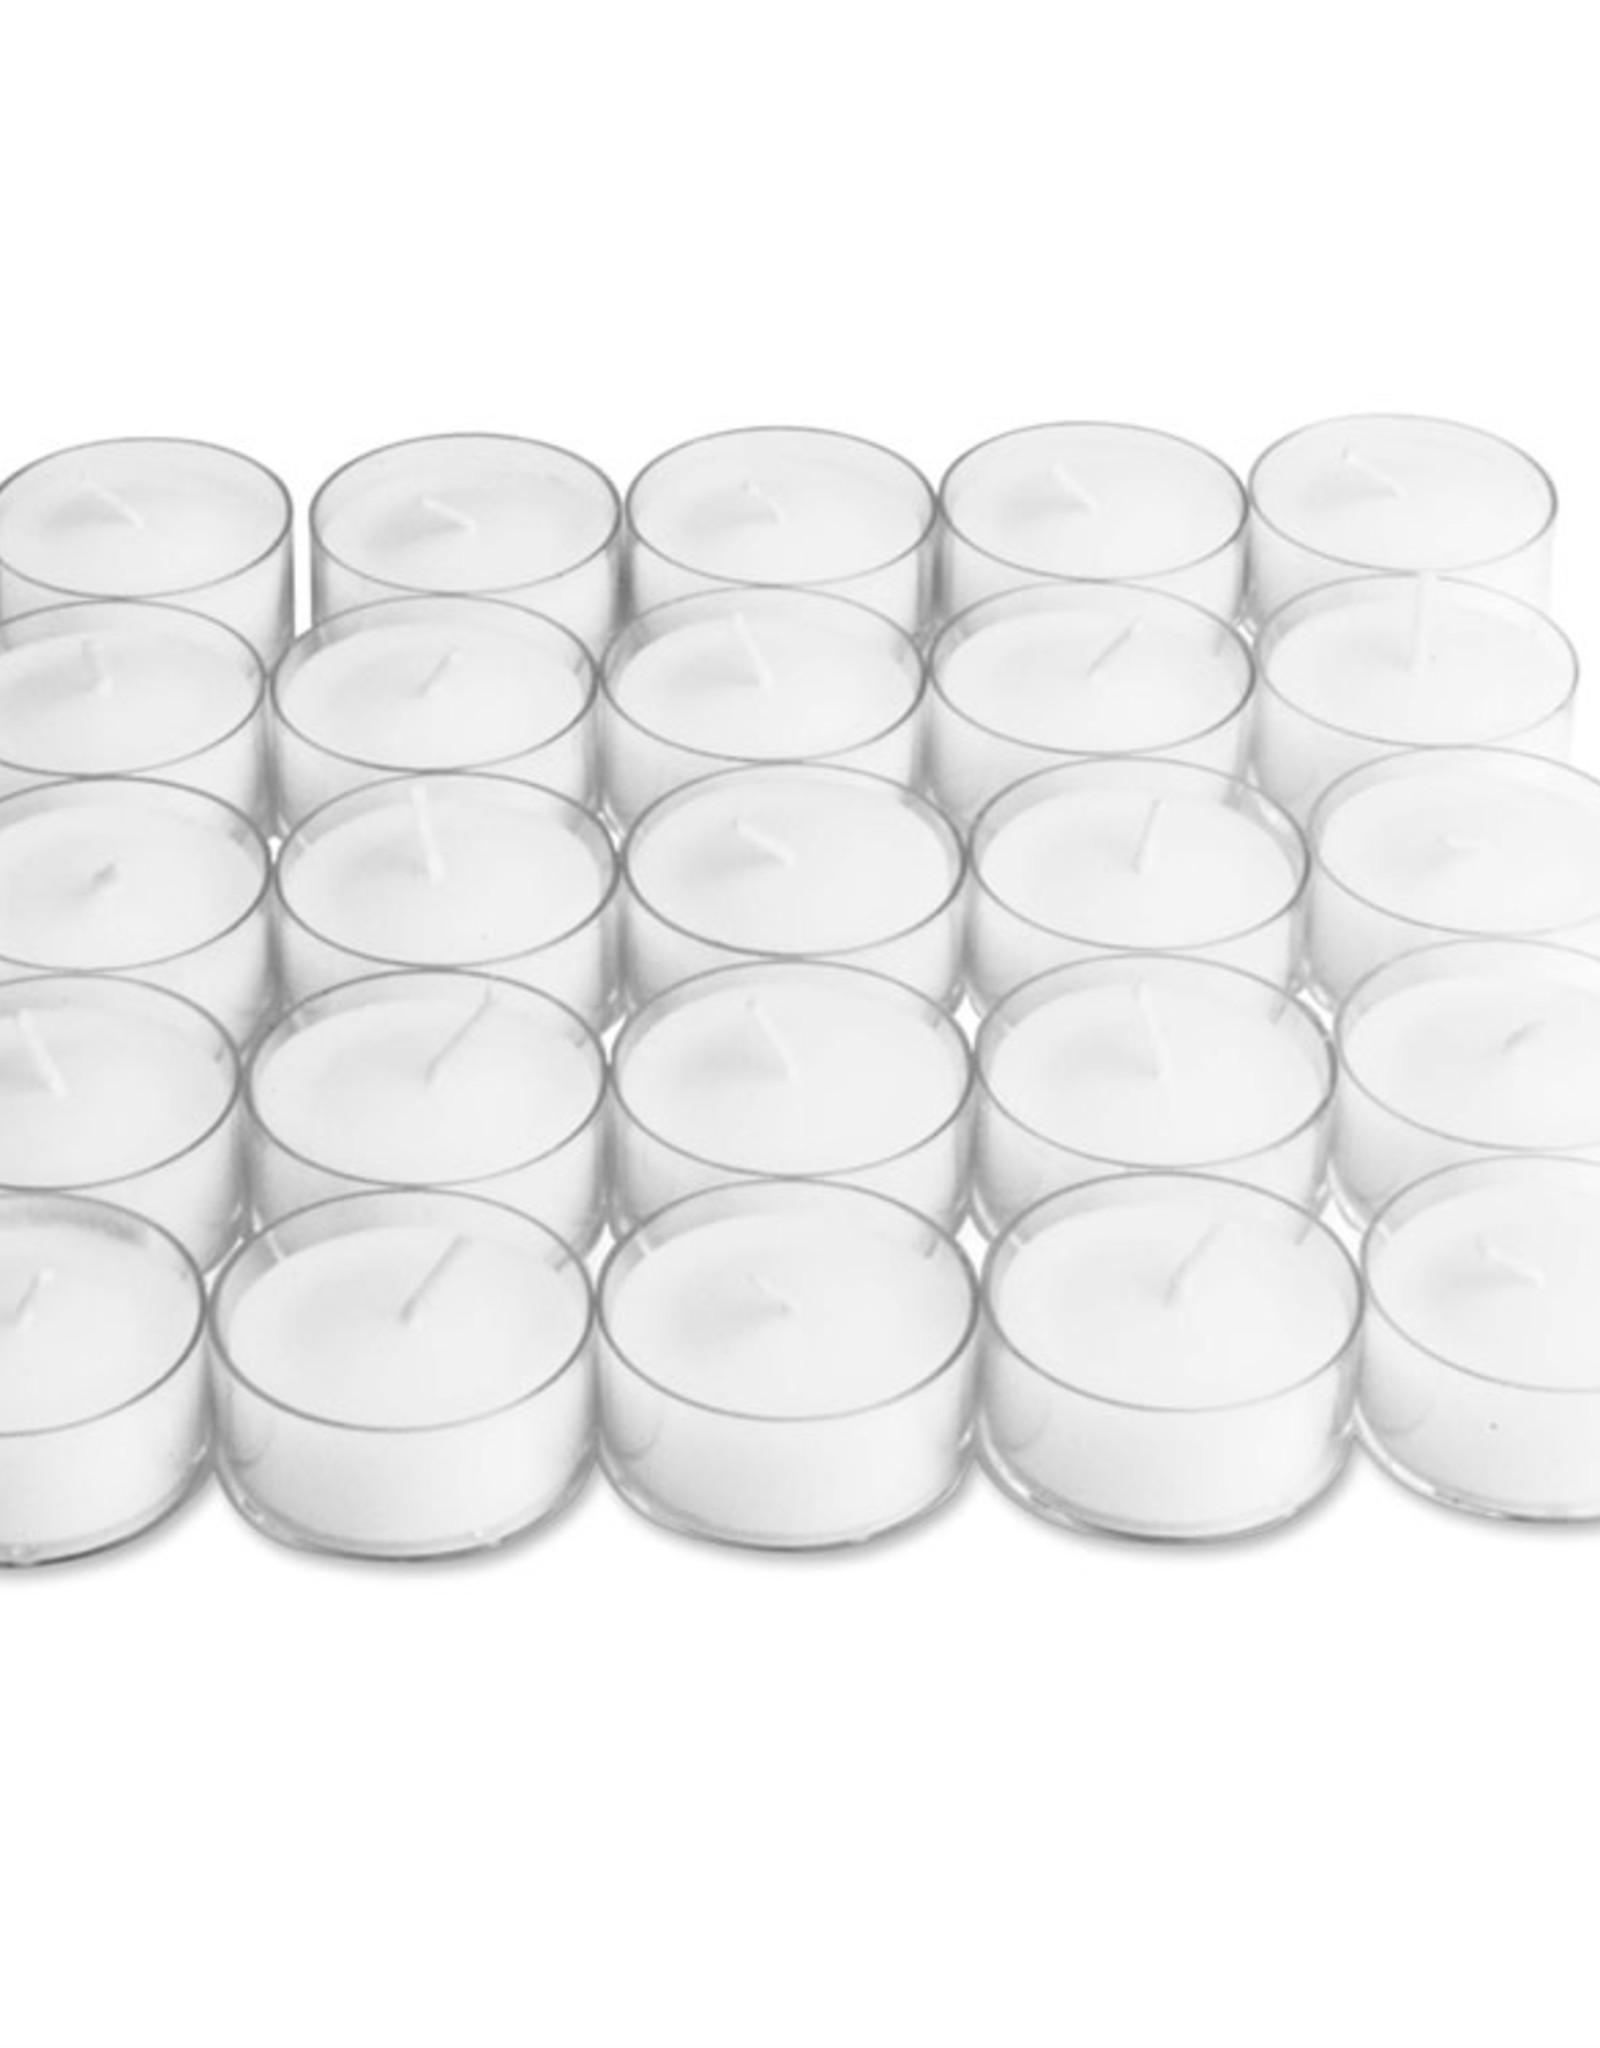 Tealight Candles - Set of 25